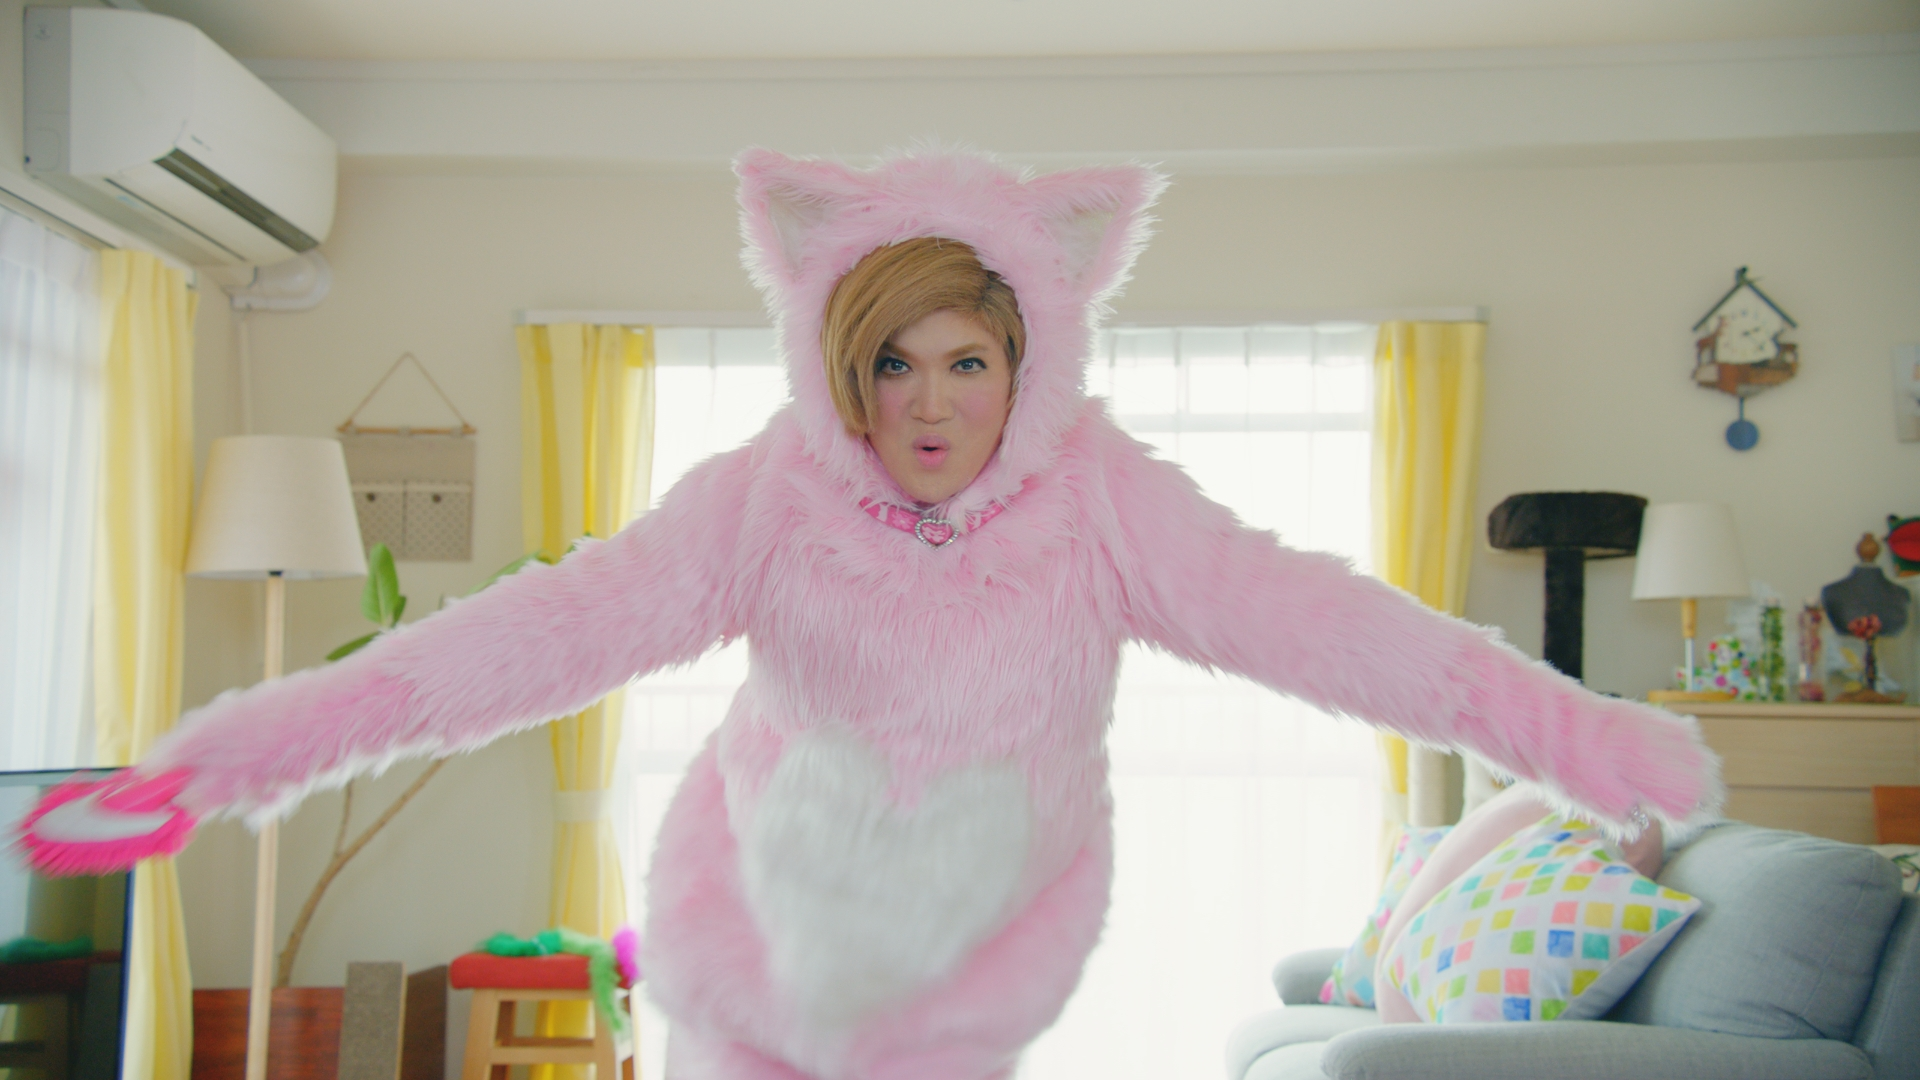 "IKKOさんがピンクの猫姿で「スマカメ~」と声を張る!IKKOさん改め""NEKKOさん""出演 「スマカメ」新CM 「NEKKO」編2019年6月17日(月)より放映開始"